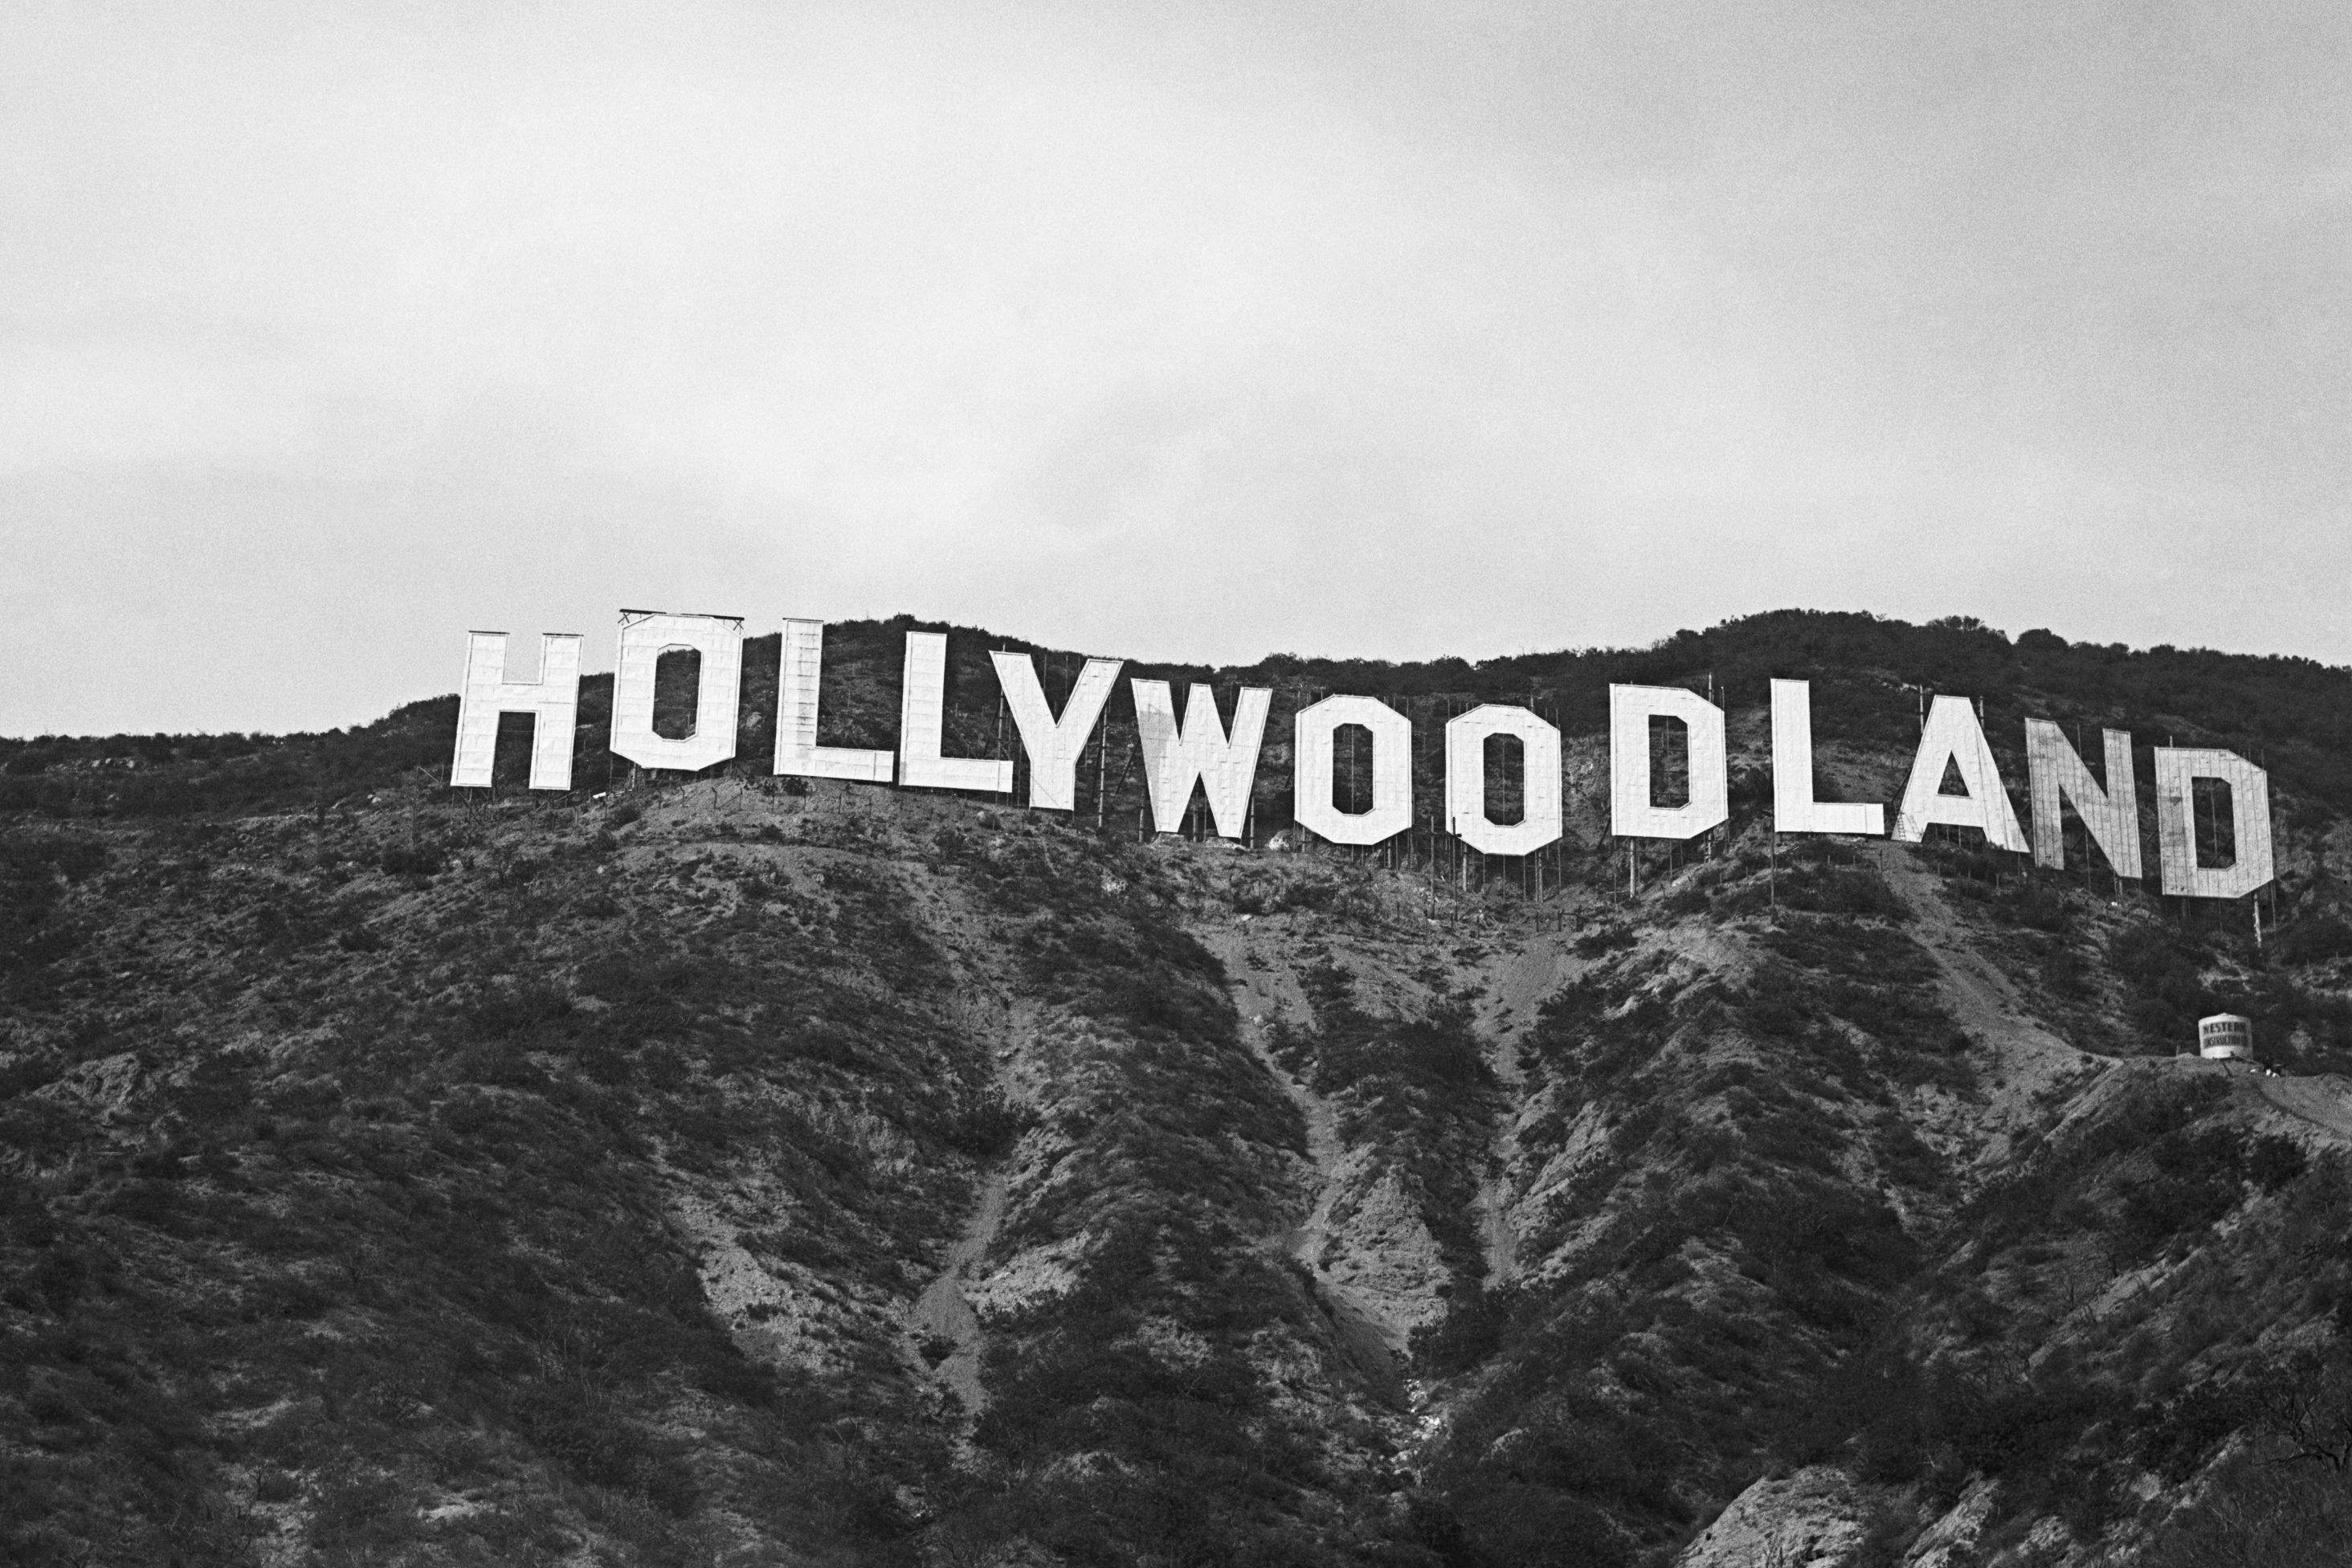 """Hollywoodland"" Sign"